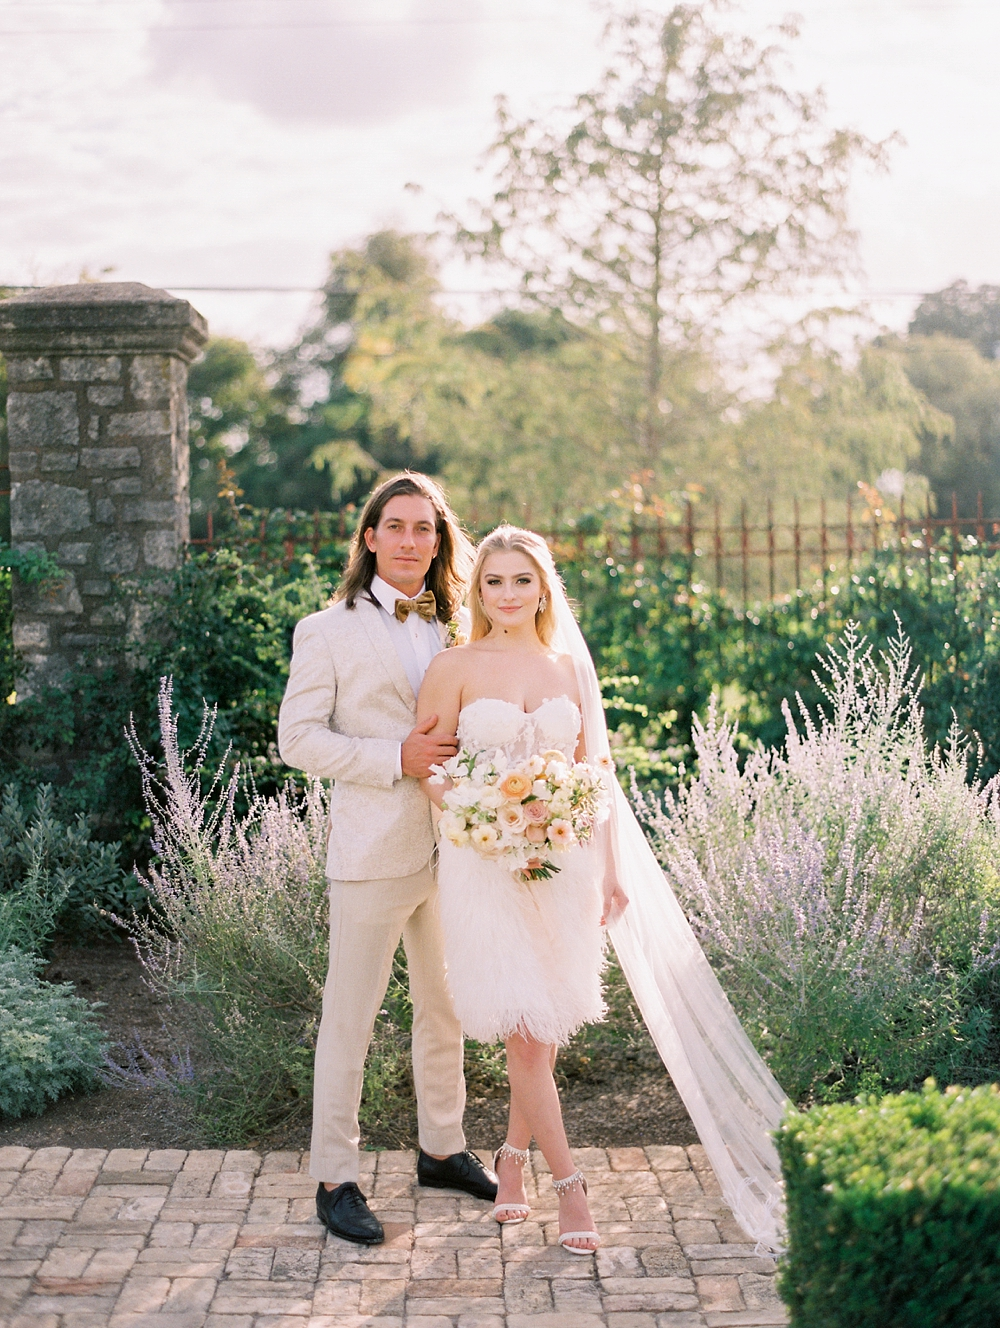 kristin-la-voie-photography-Austin-Wedding-Boudoir-Photographer-Commodore-Perry-Estate-44